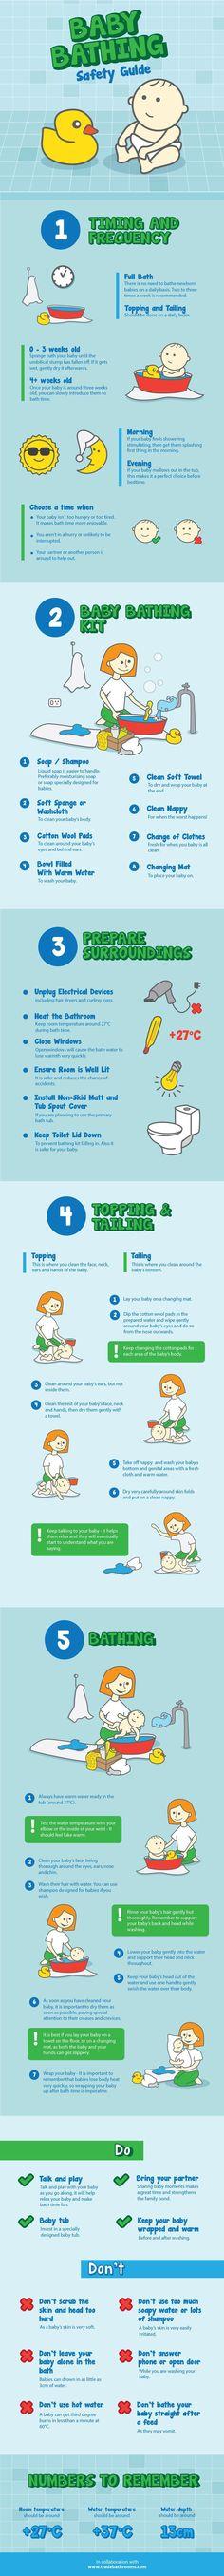 Tips on how to bathe your new baby! (scheduled via http://www.tailwindapp.com?utm_source=pinterest&utm_medium=twpin)